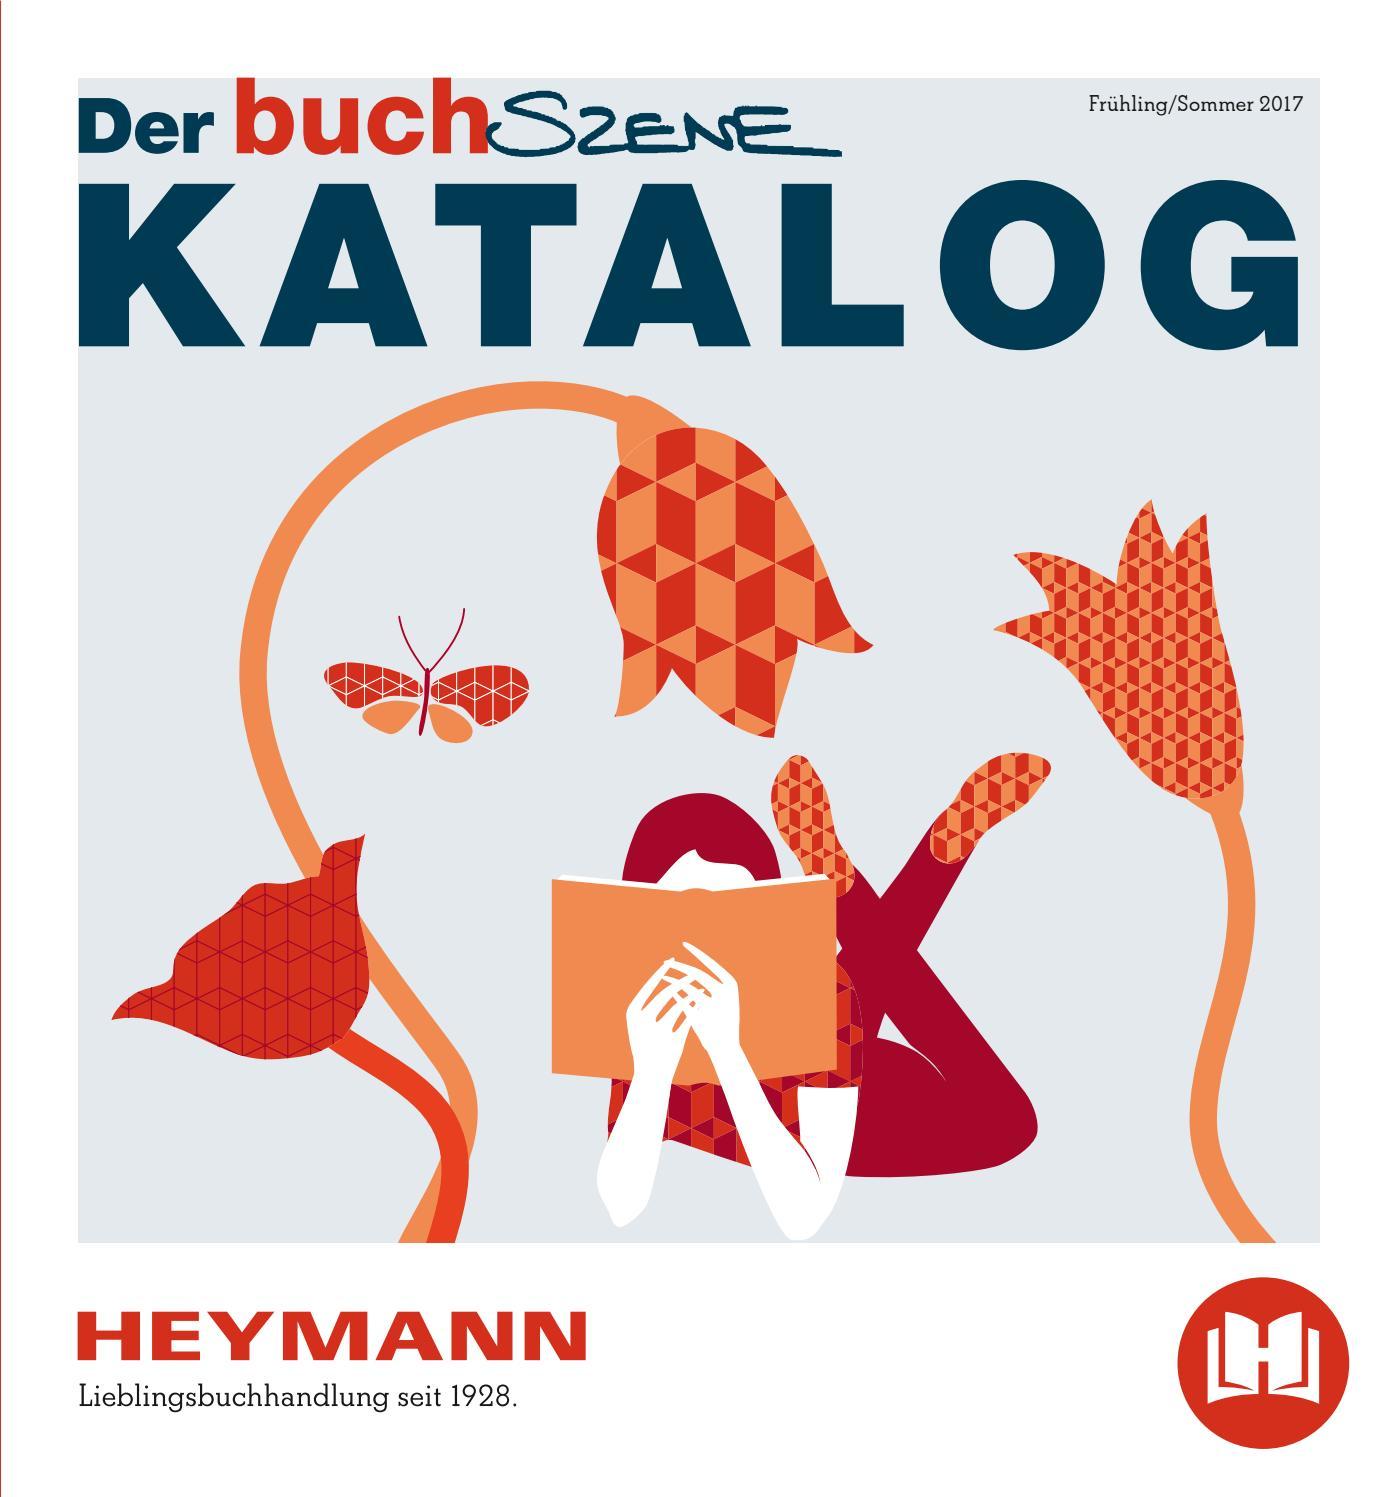 Buchhandlung Heymann buchSZENE Katalog Frühling Sommer by